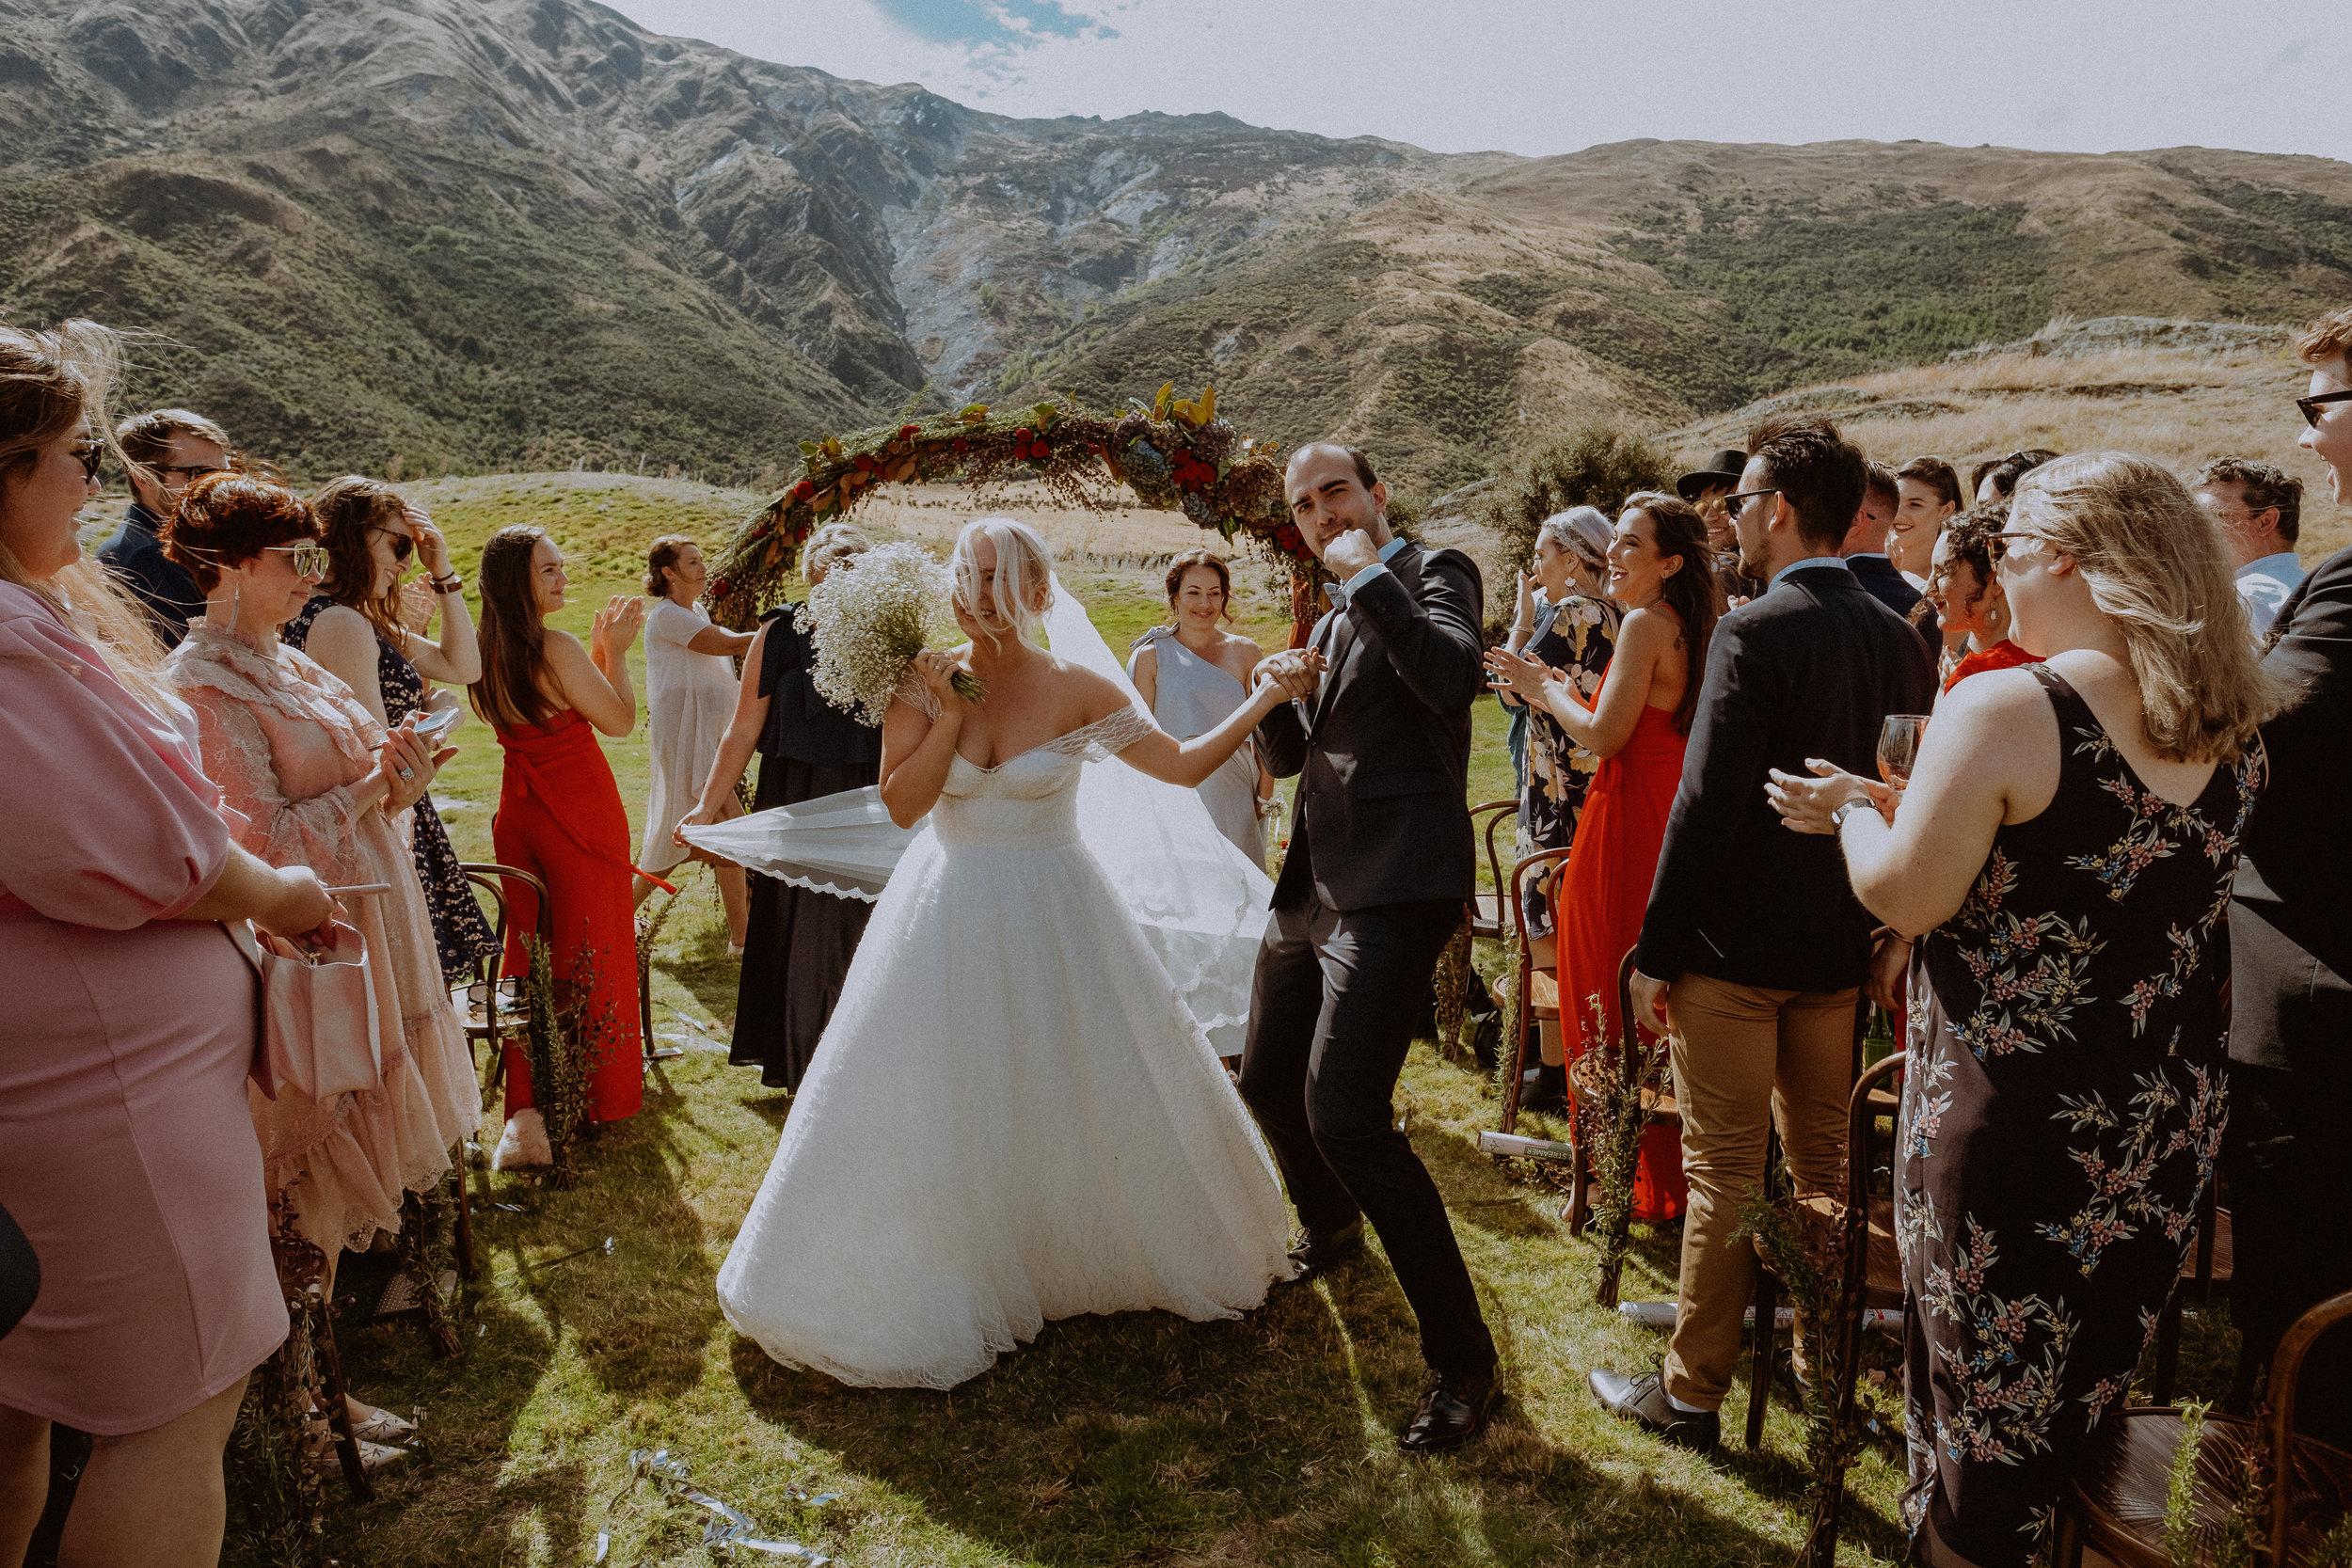 perrigrine wines wedding kseniya and travis chellise michael photography671.JPG